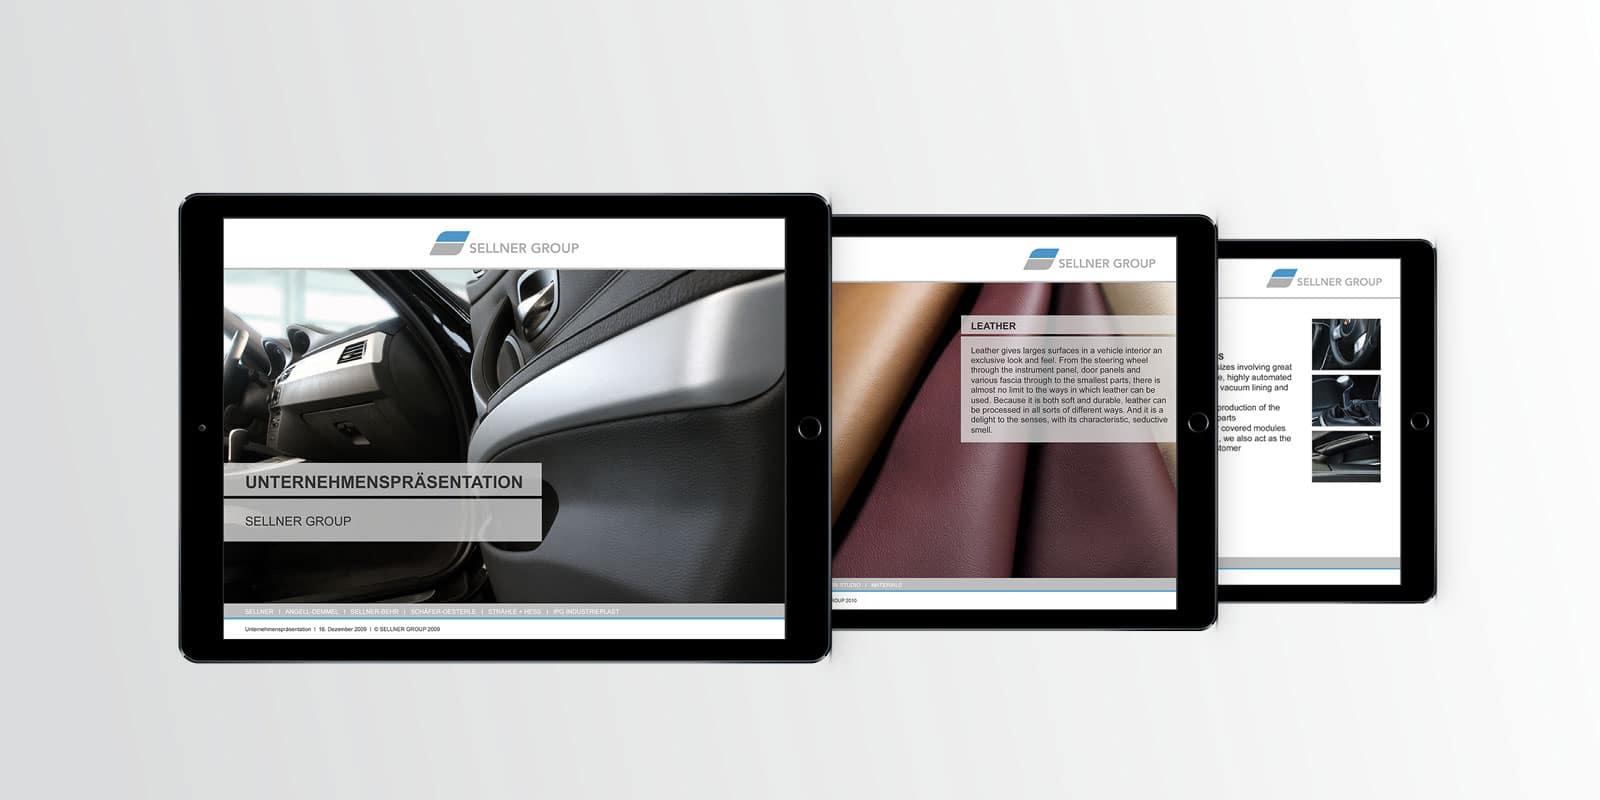 Sellner Group – Unternehmenspräsentation